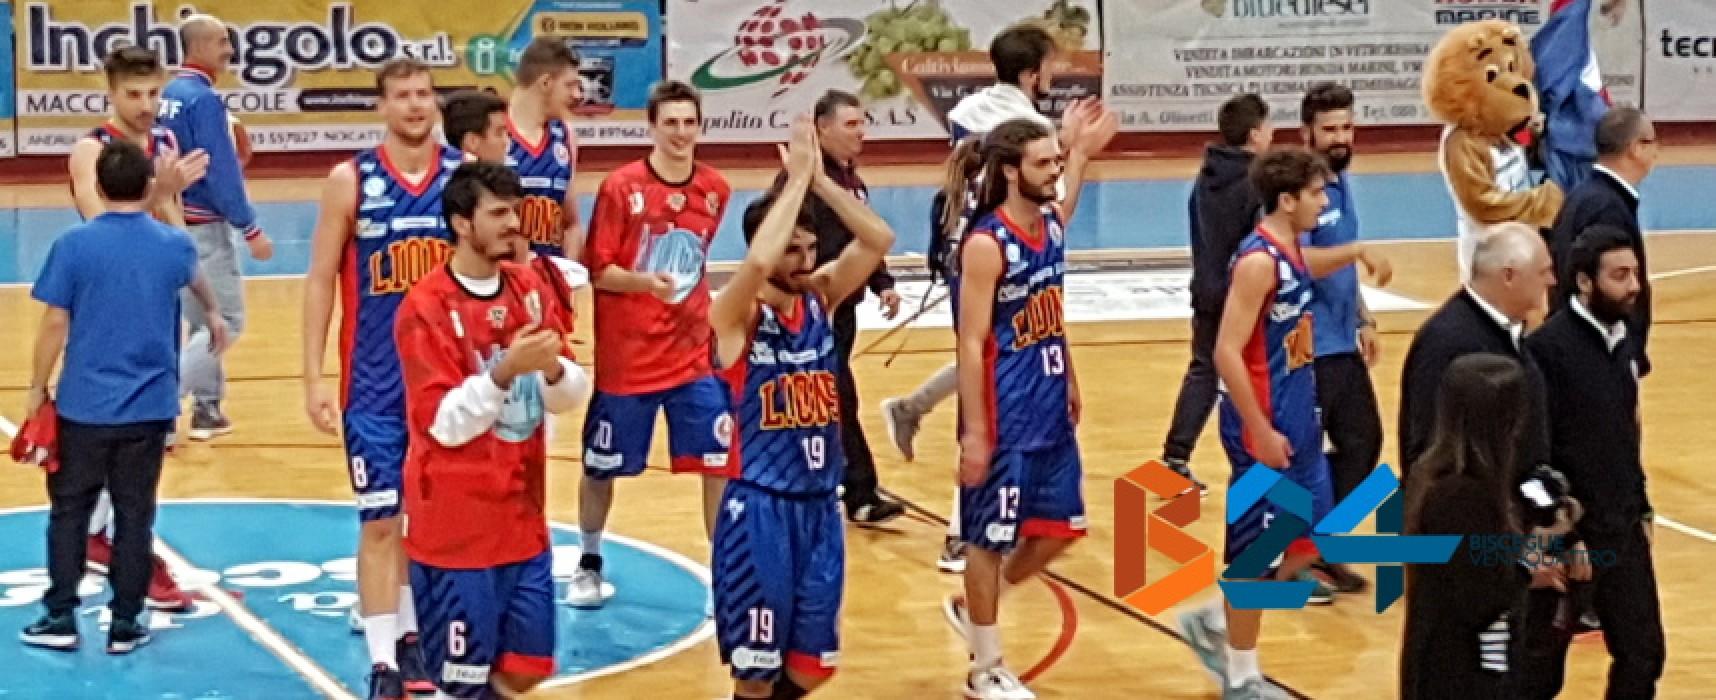 Lions Basket importante vittoria casalinga contro l'ostica Ortona